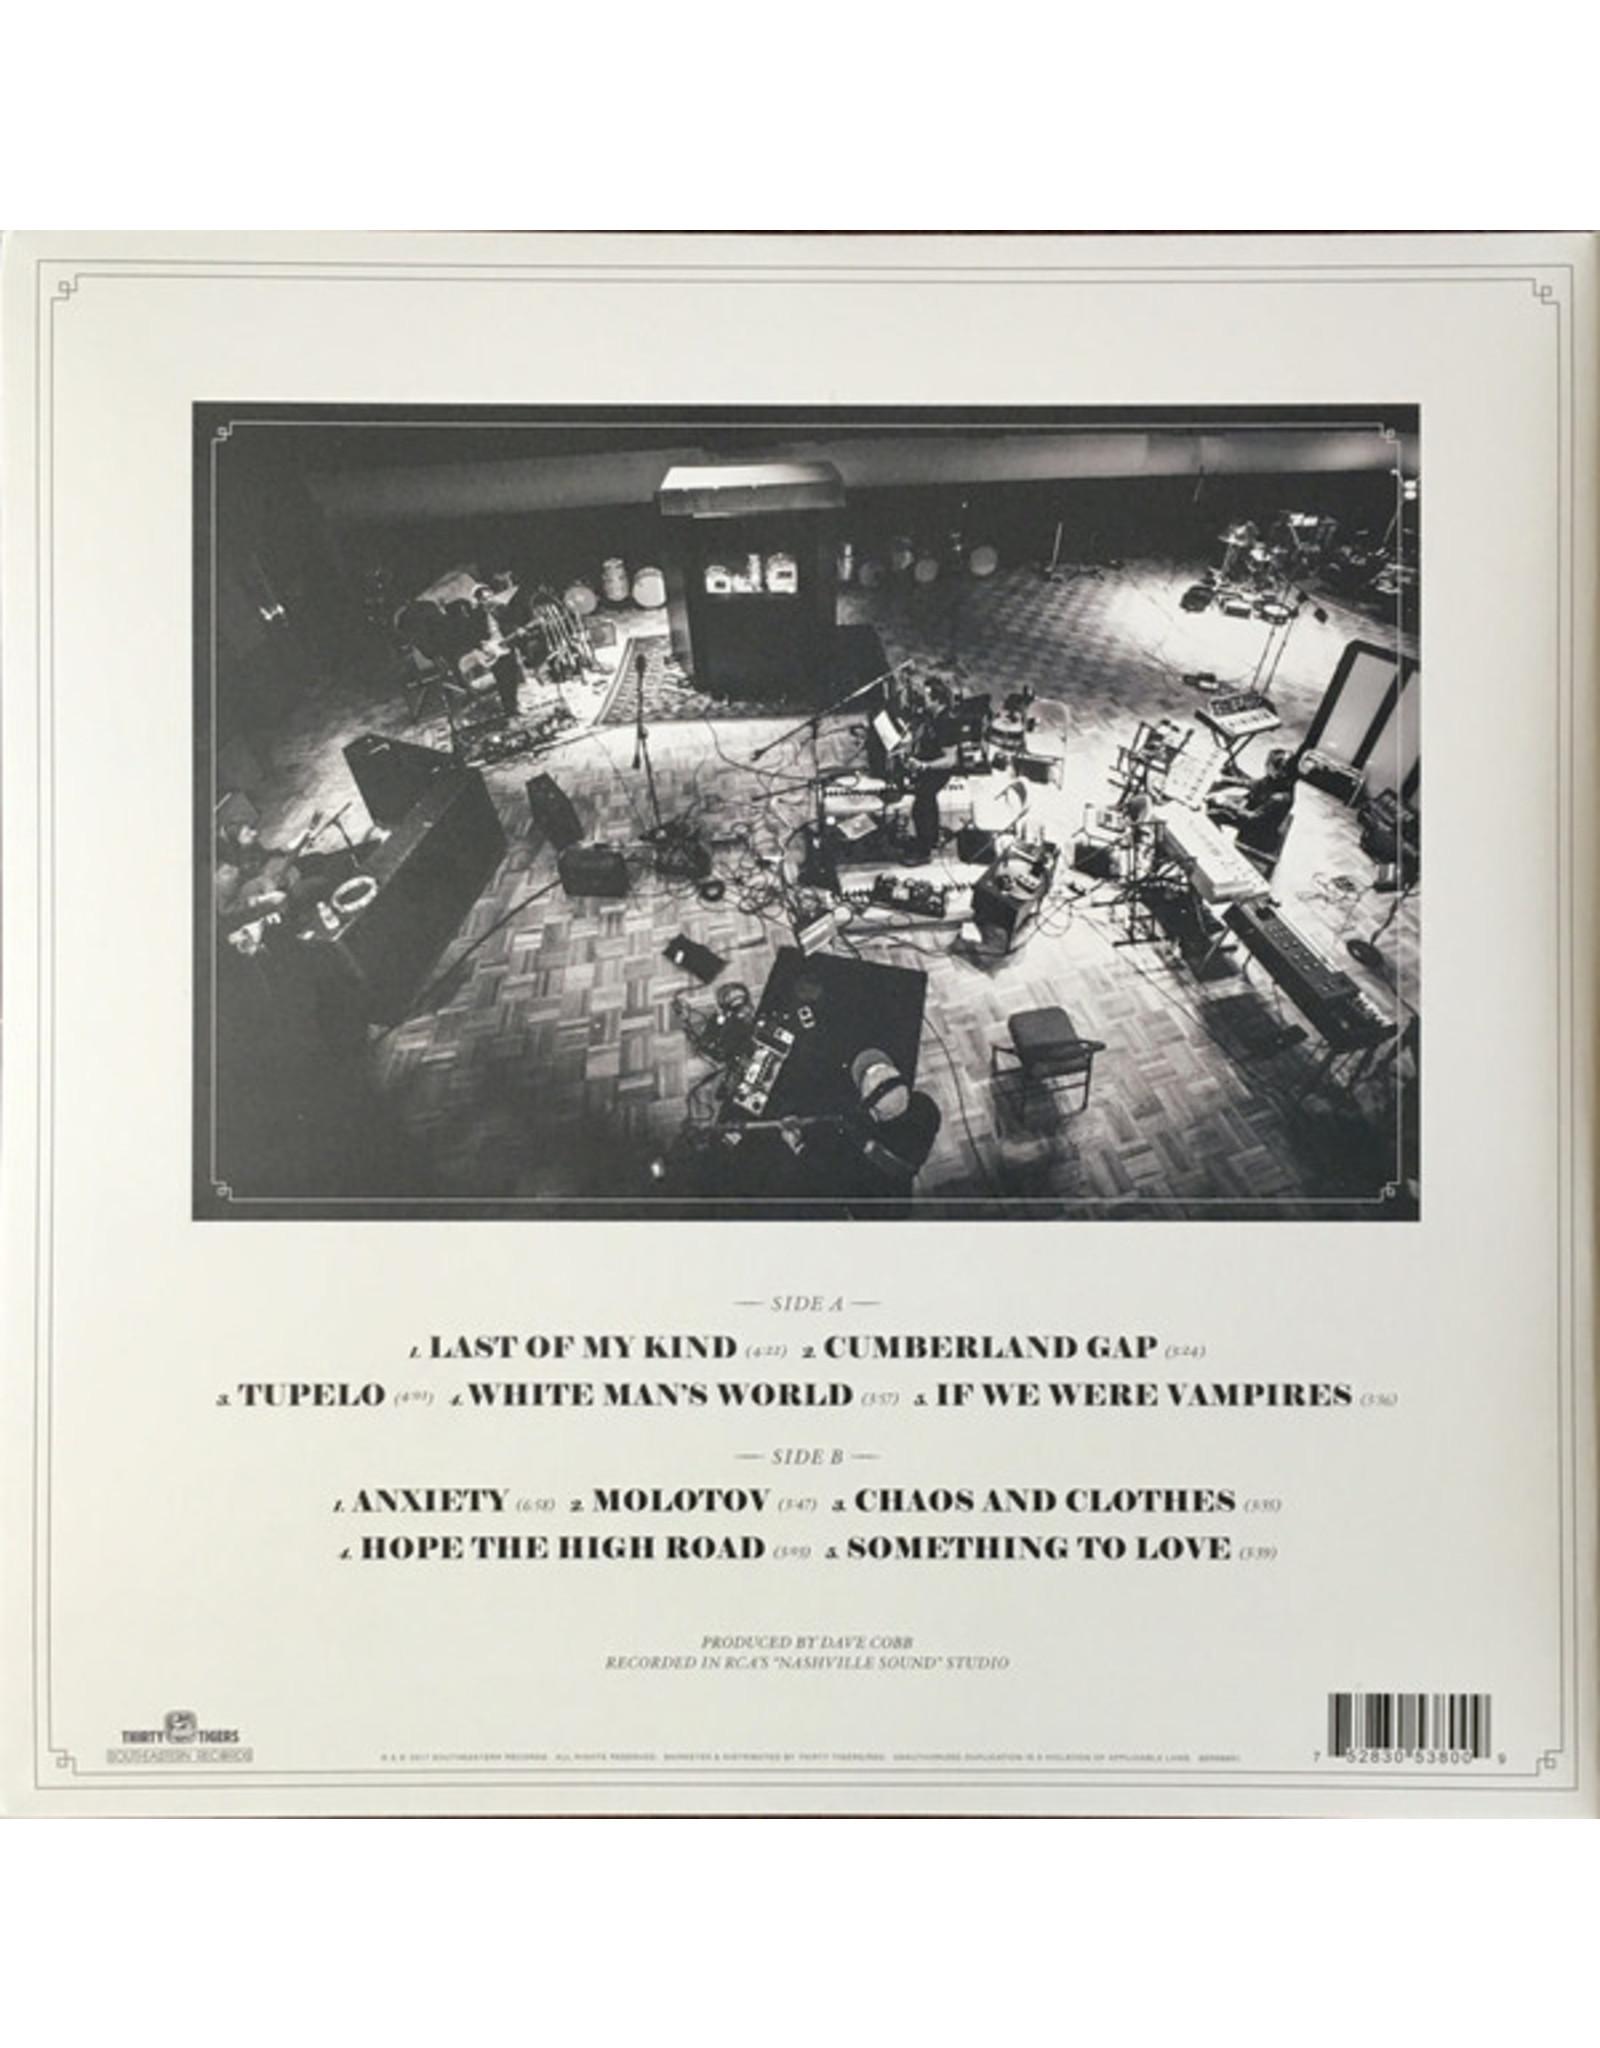 Jason Isbell & The 400 Unit - Nashville Sound